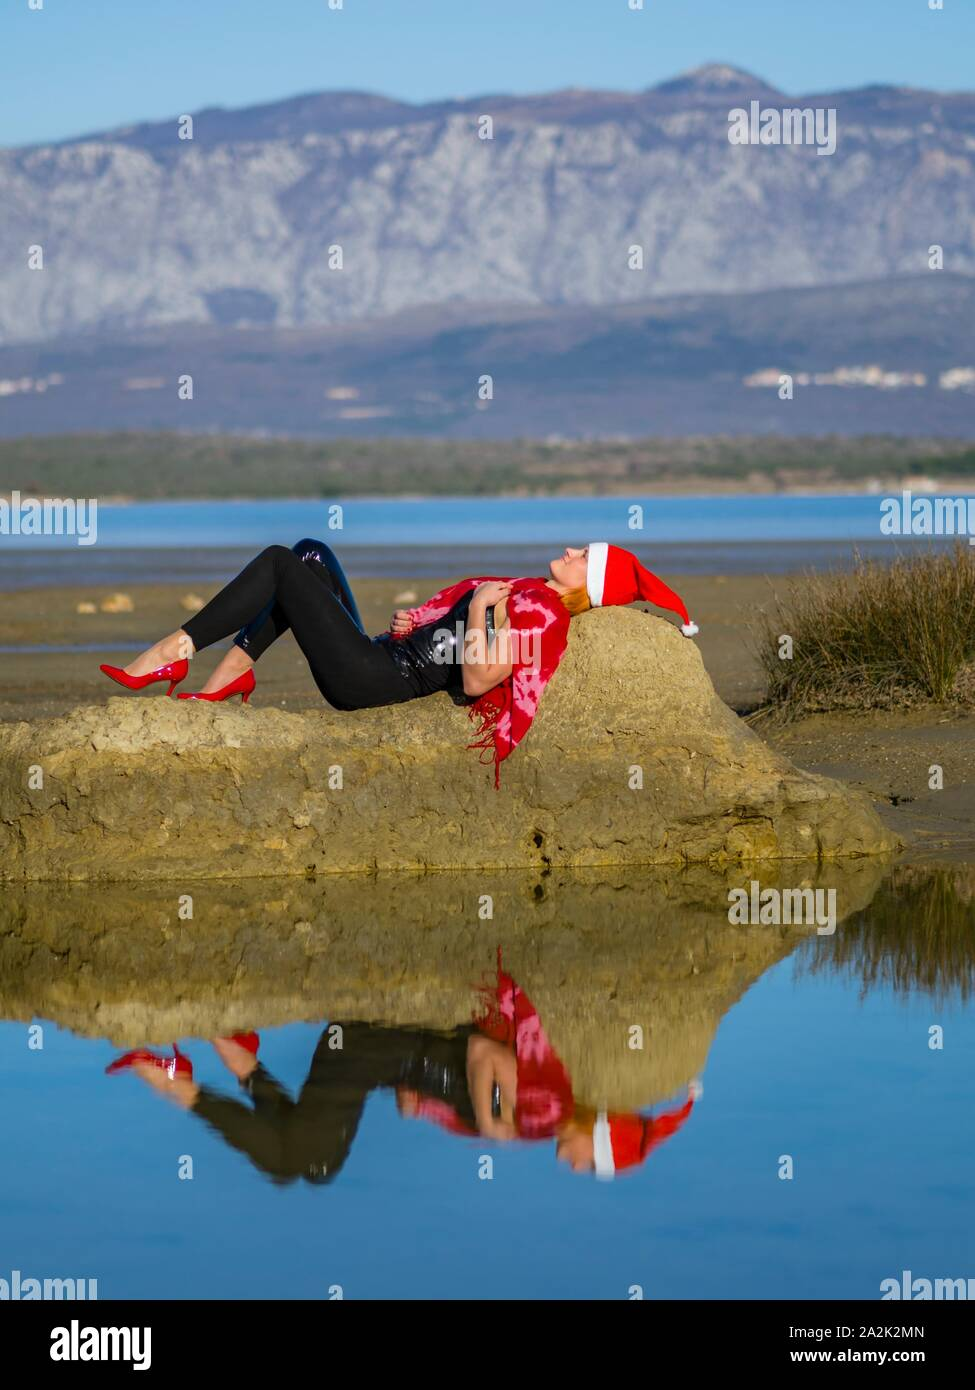 Resting female Santa Stock Photo